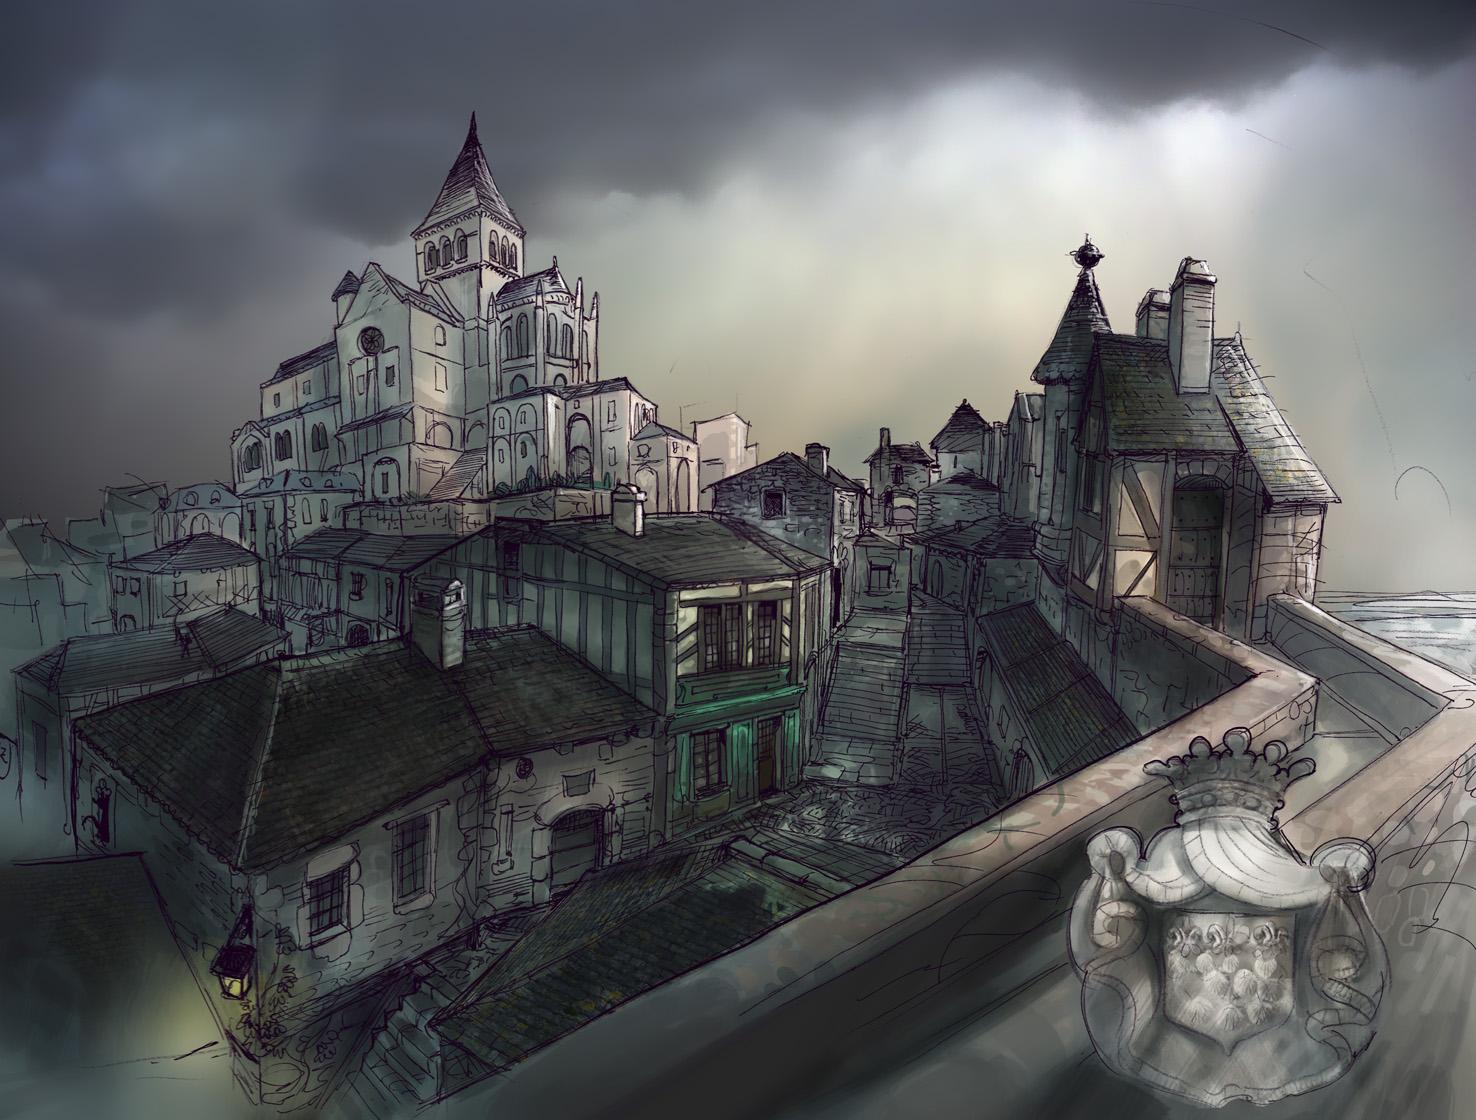 yannick corboz illustration 5